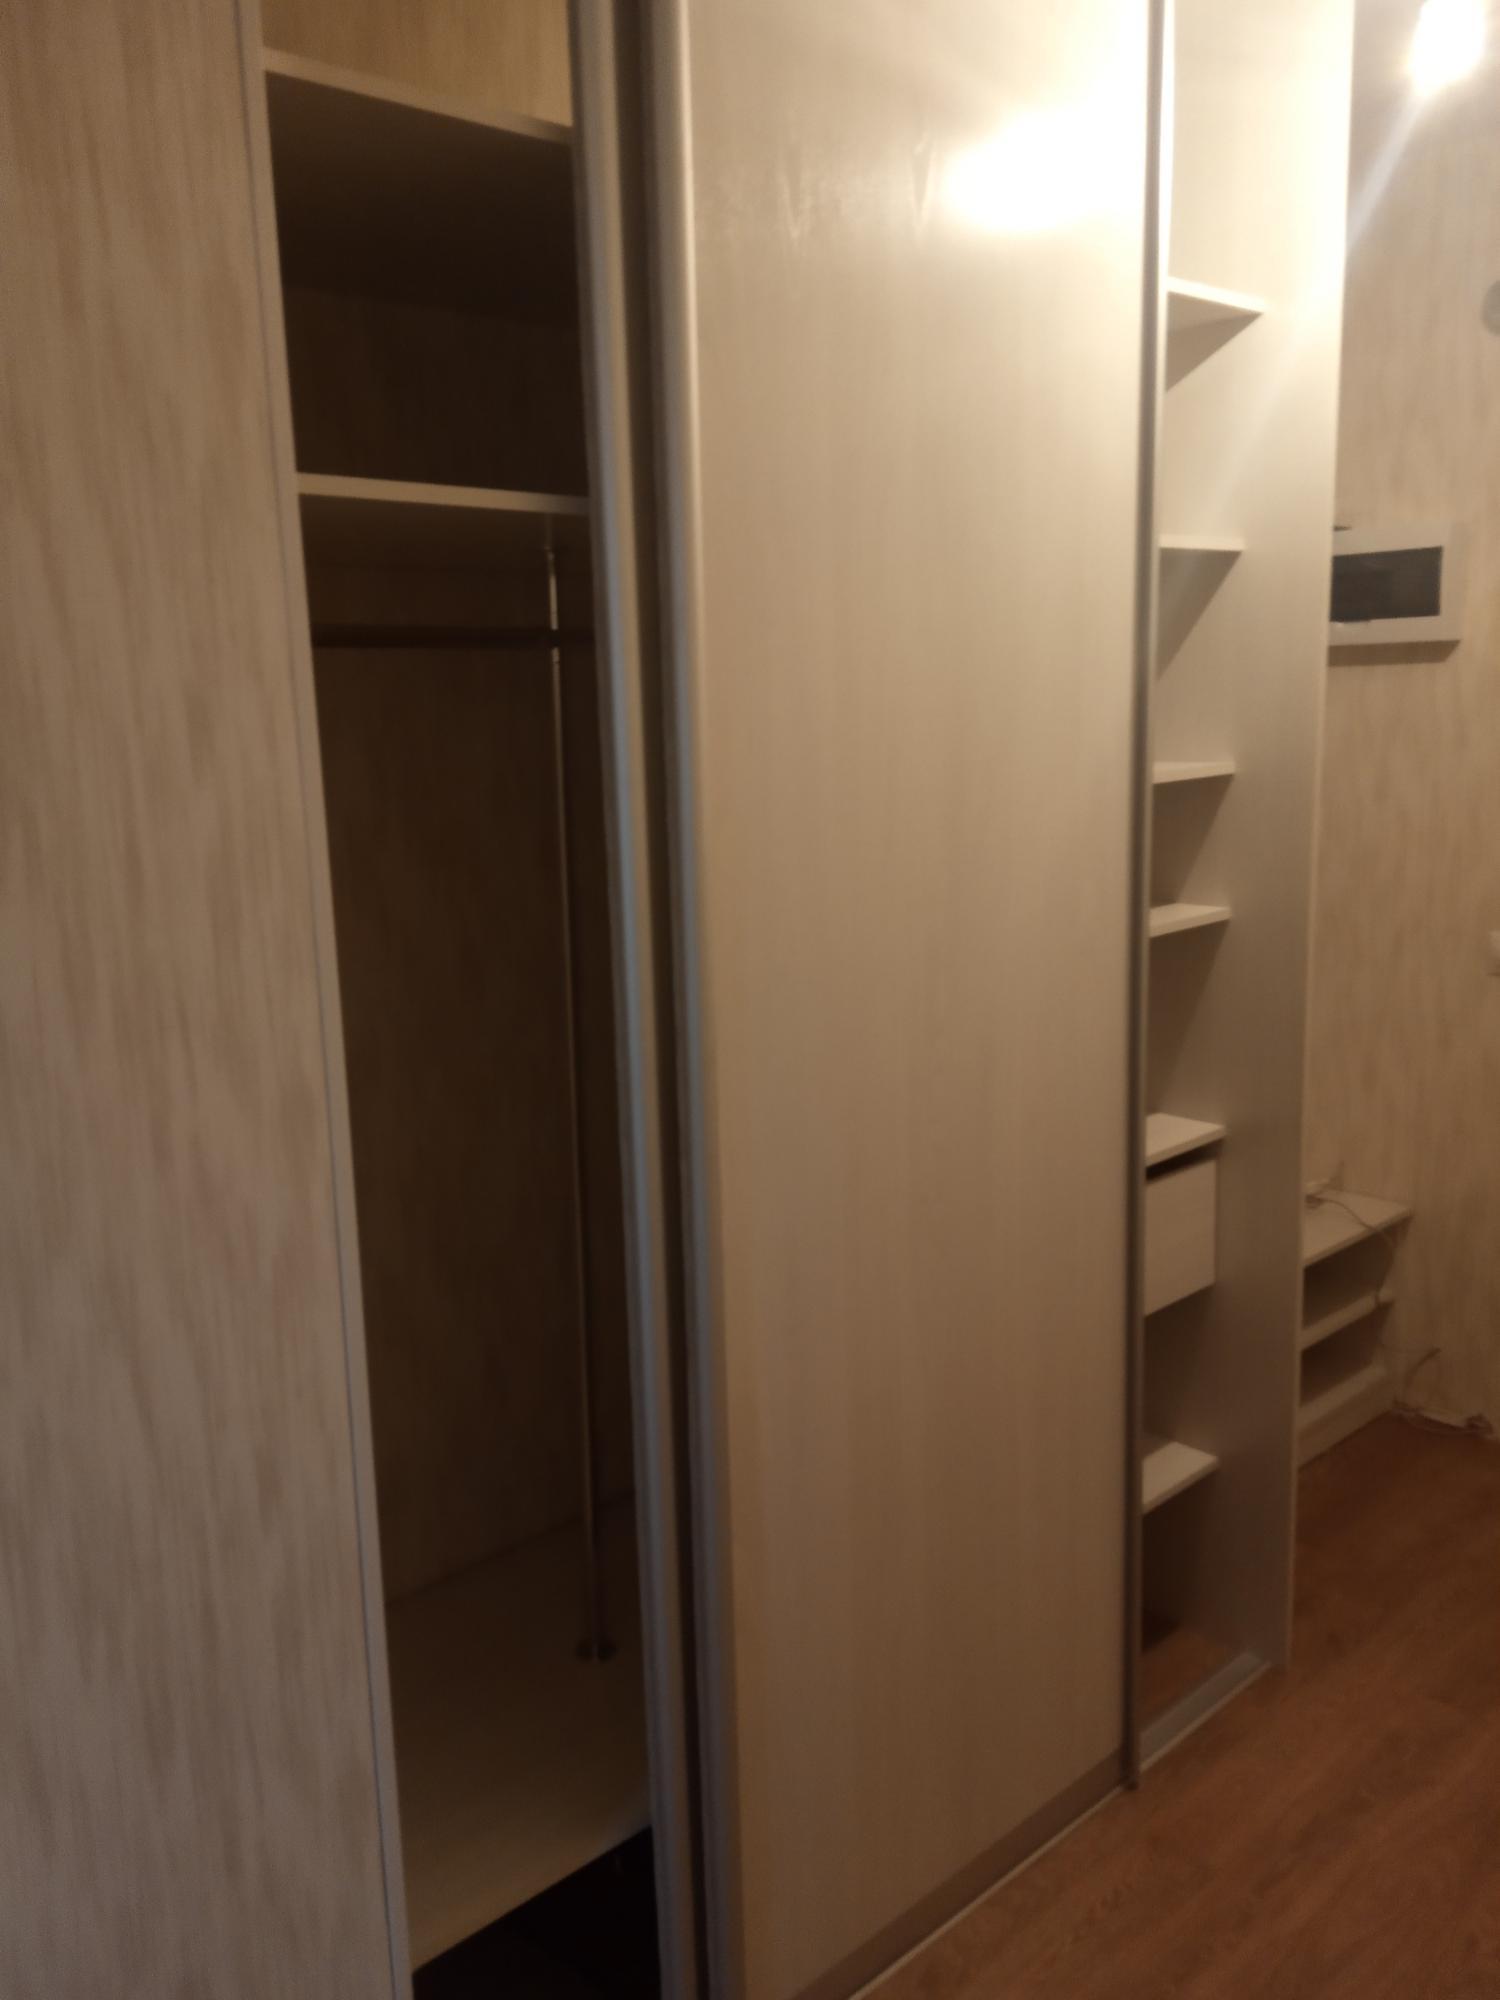 1к квартира Краснодарская улица, 22А | 15500 | аренда в Красноярске фото 2